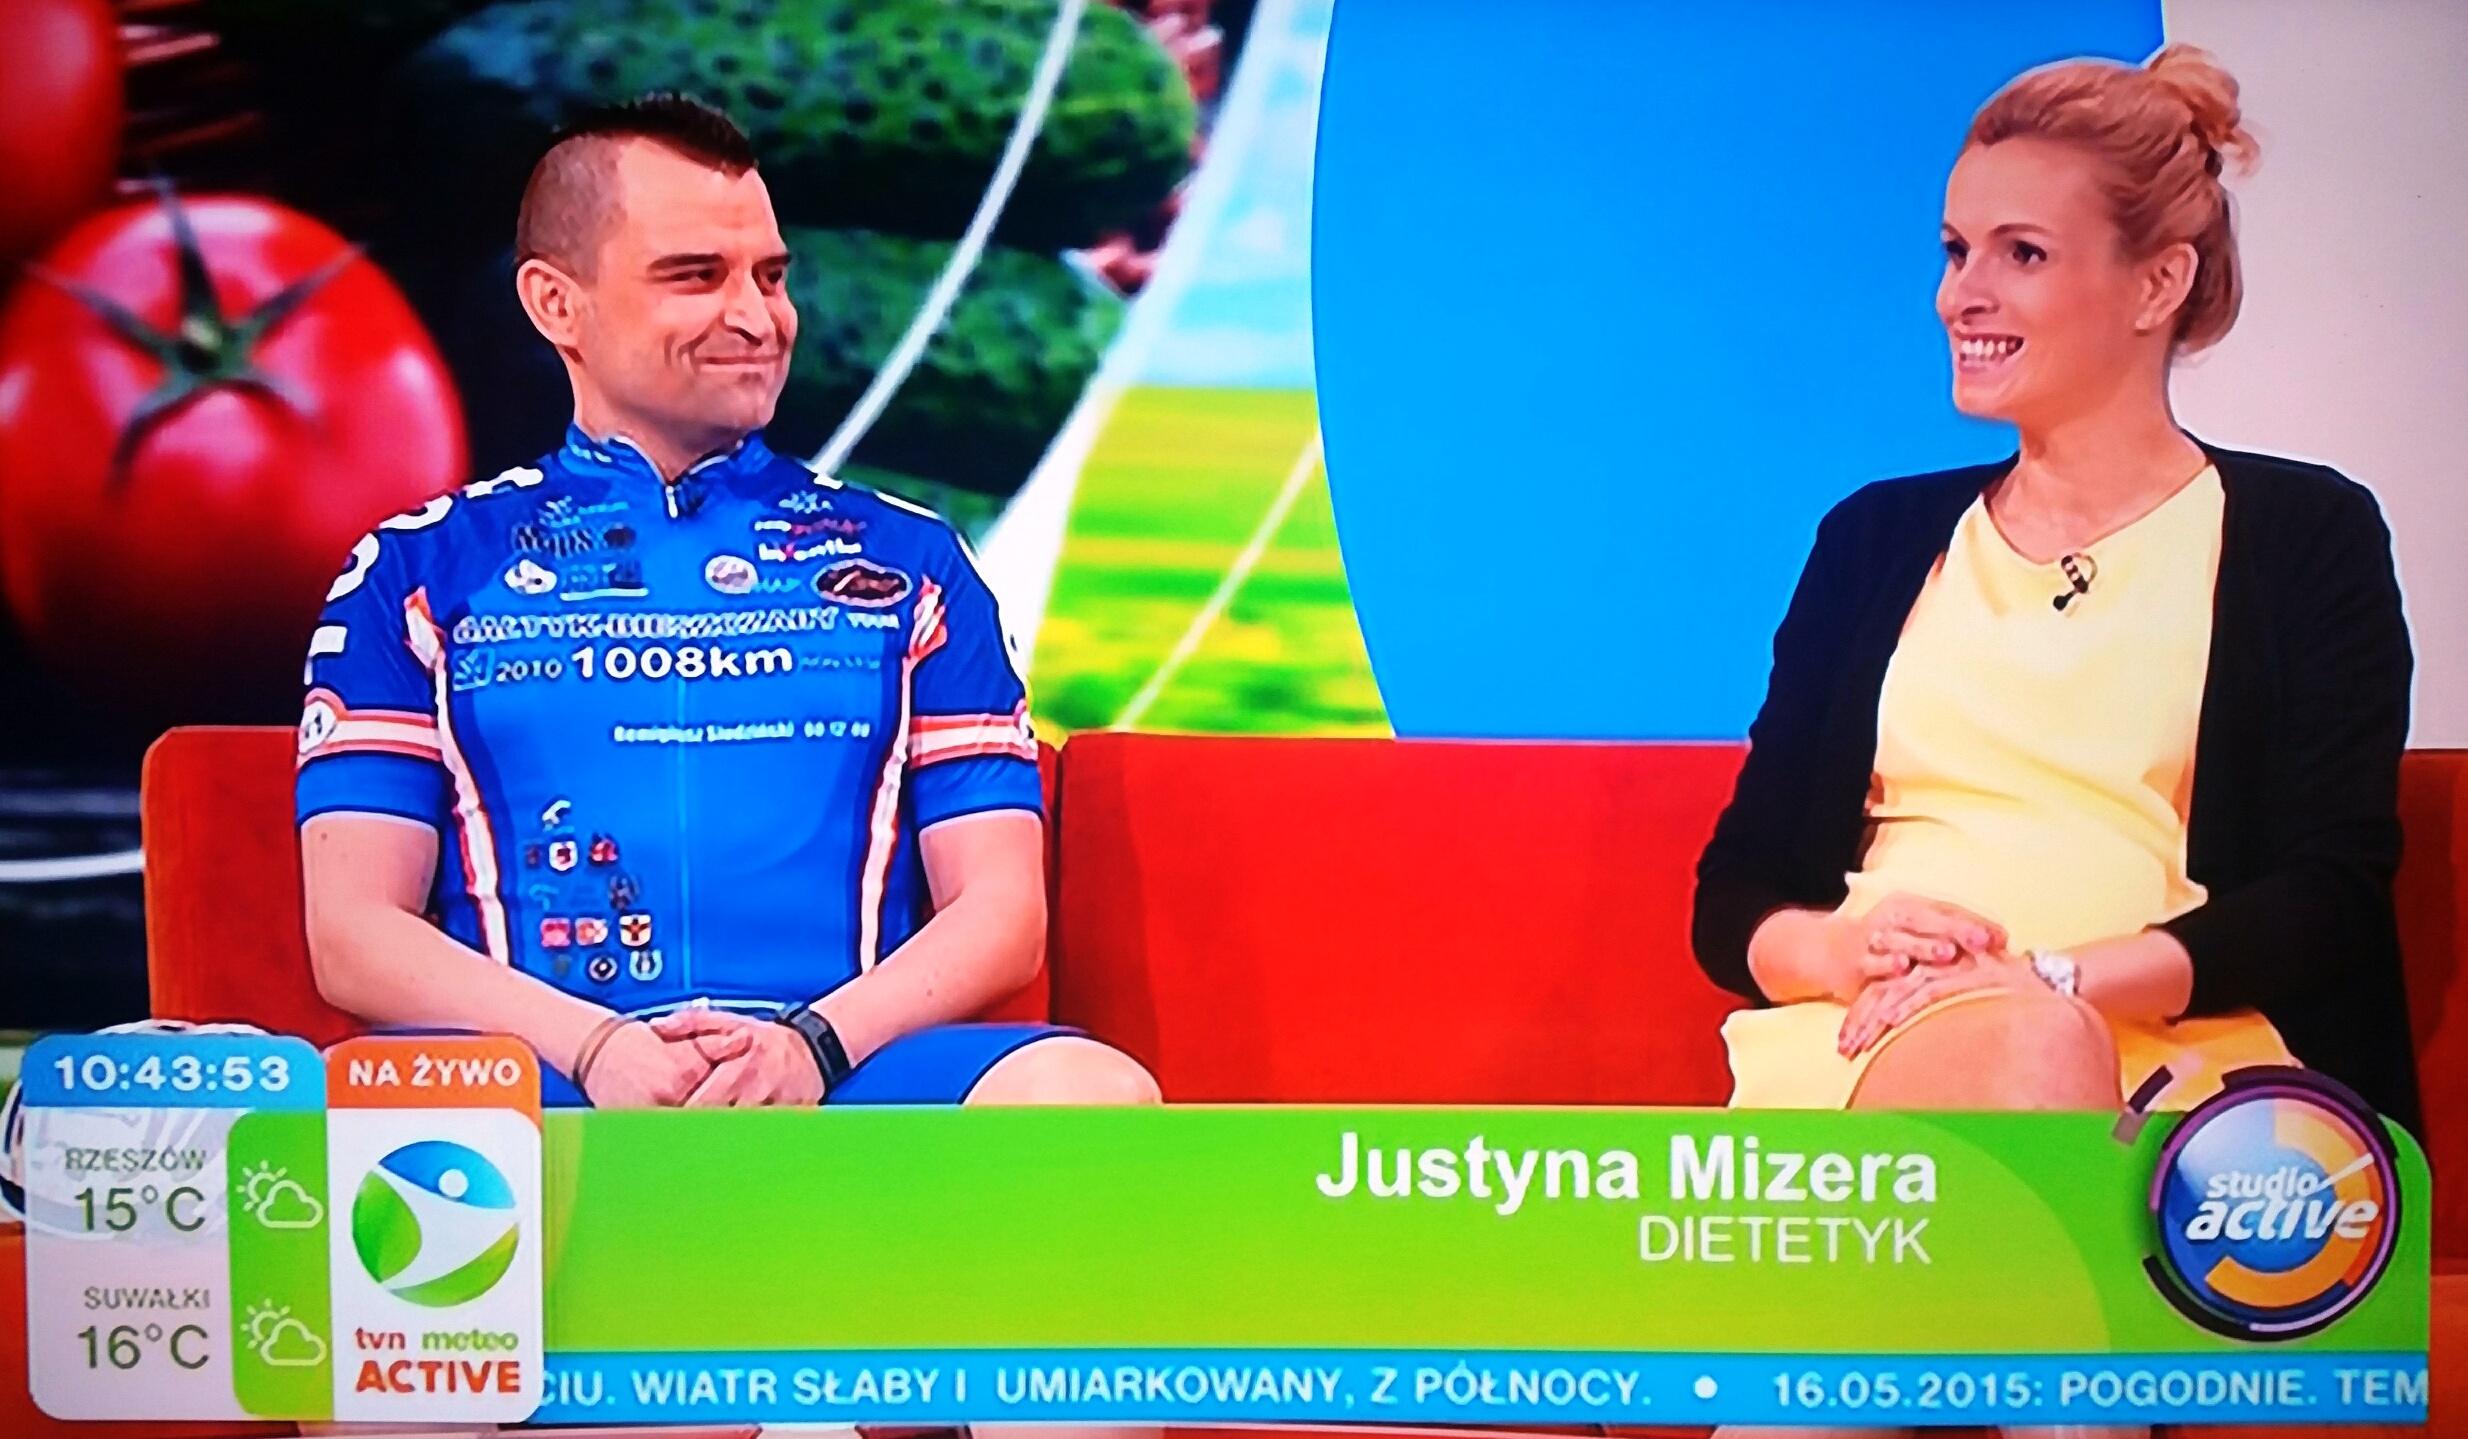 Justyna Mizera - dieta kolarzy